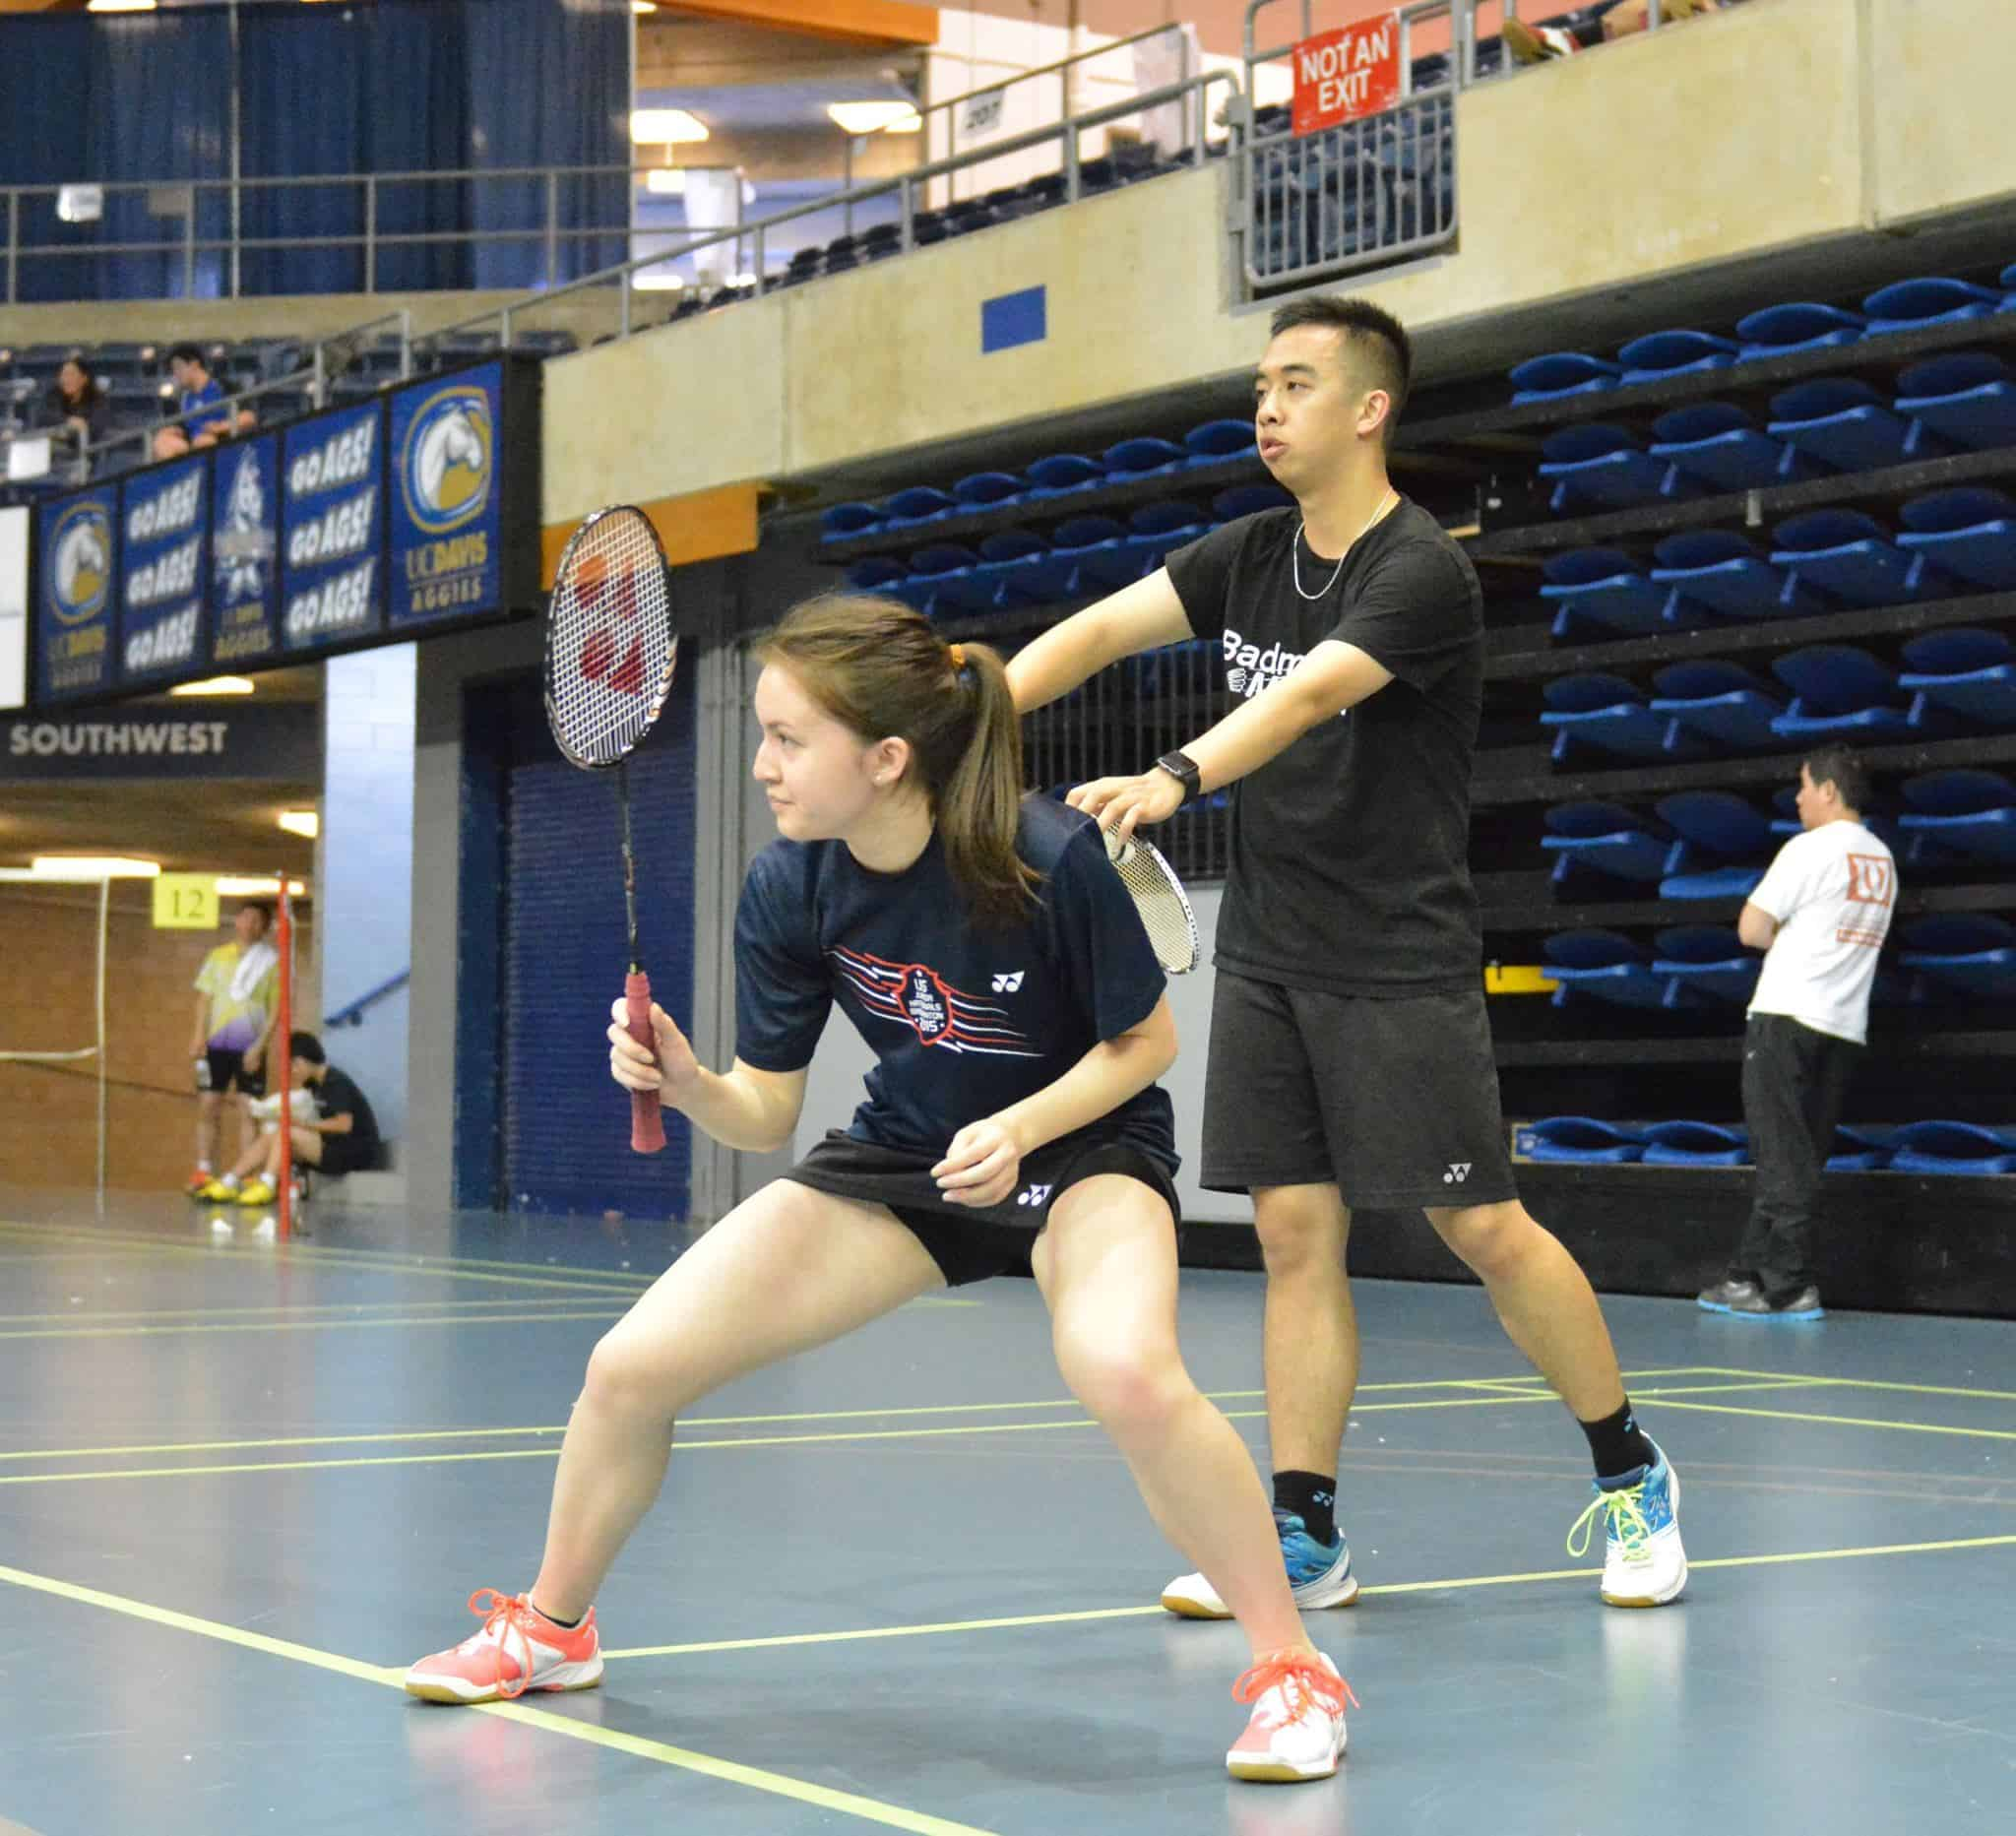 Badminton players playing badminton